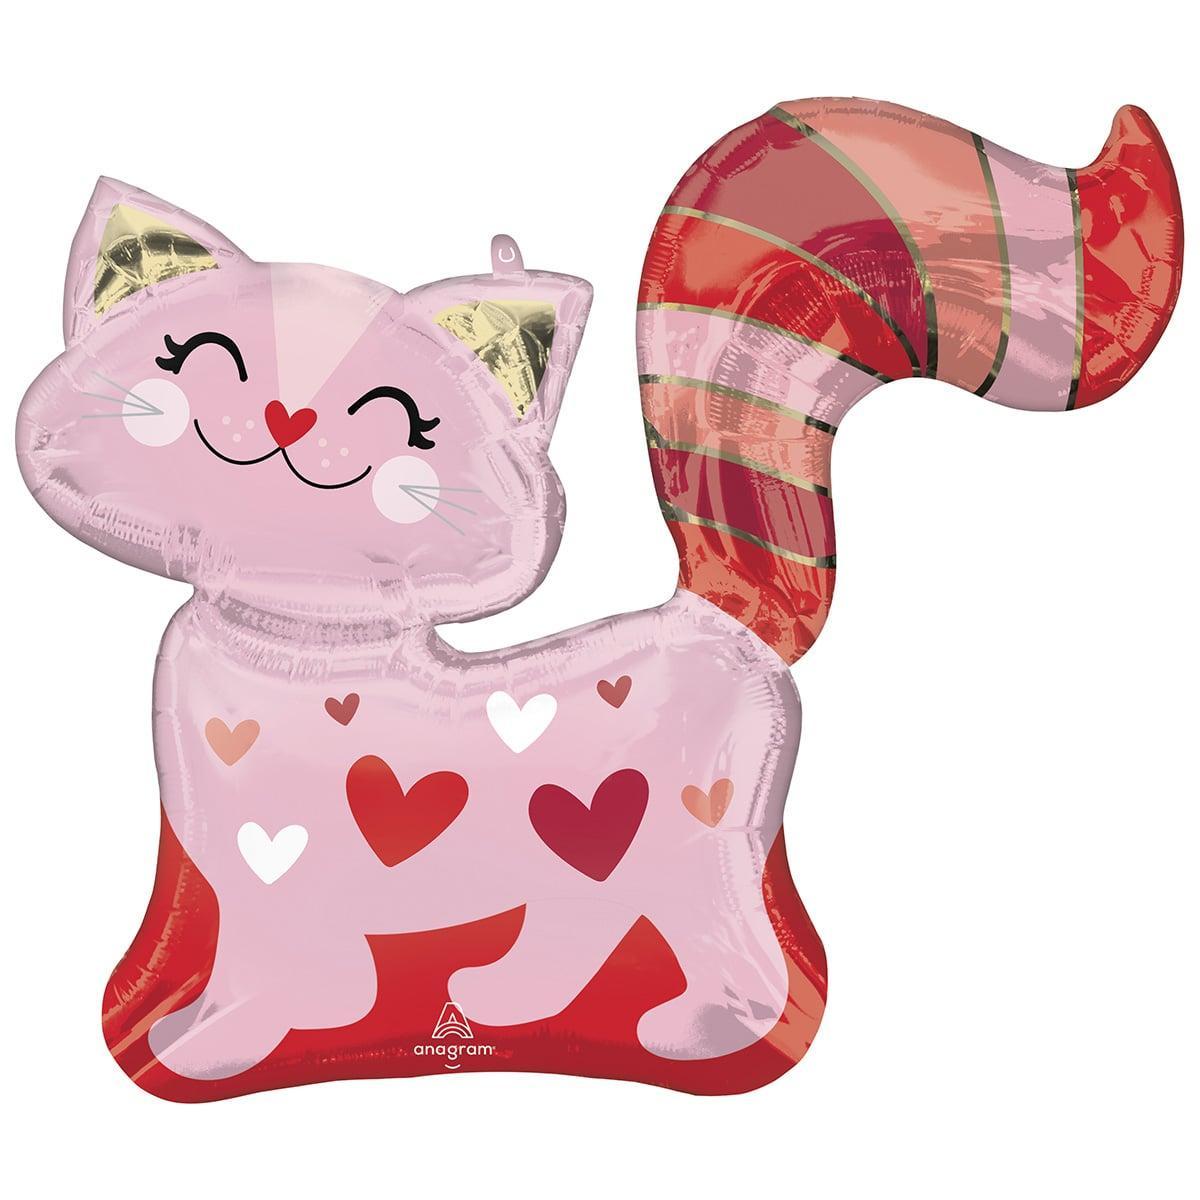 Фол куля фігура Кішечка рожева в сердечках (Анаграм)